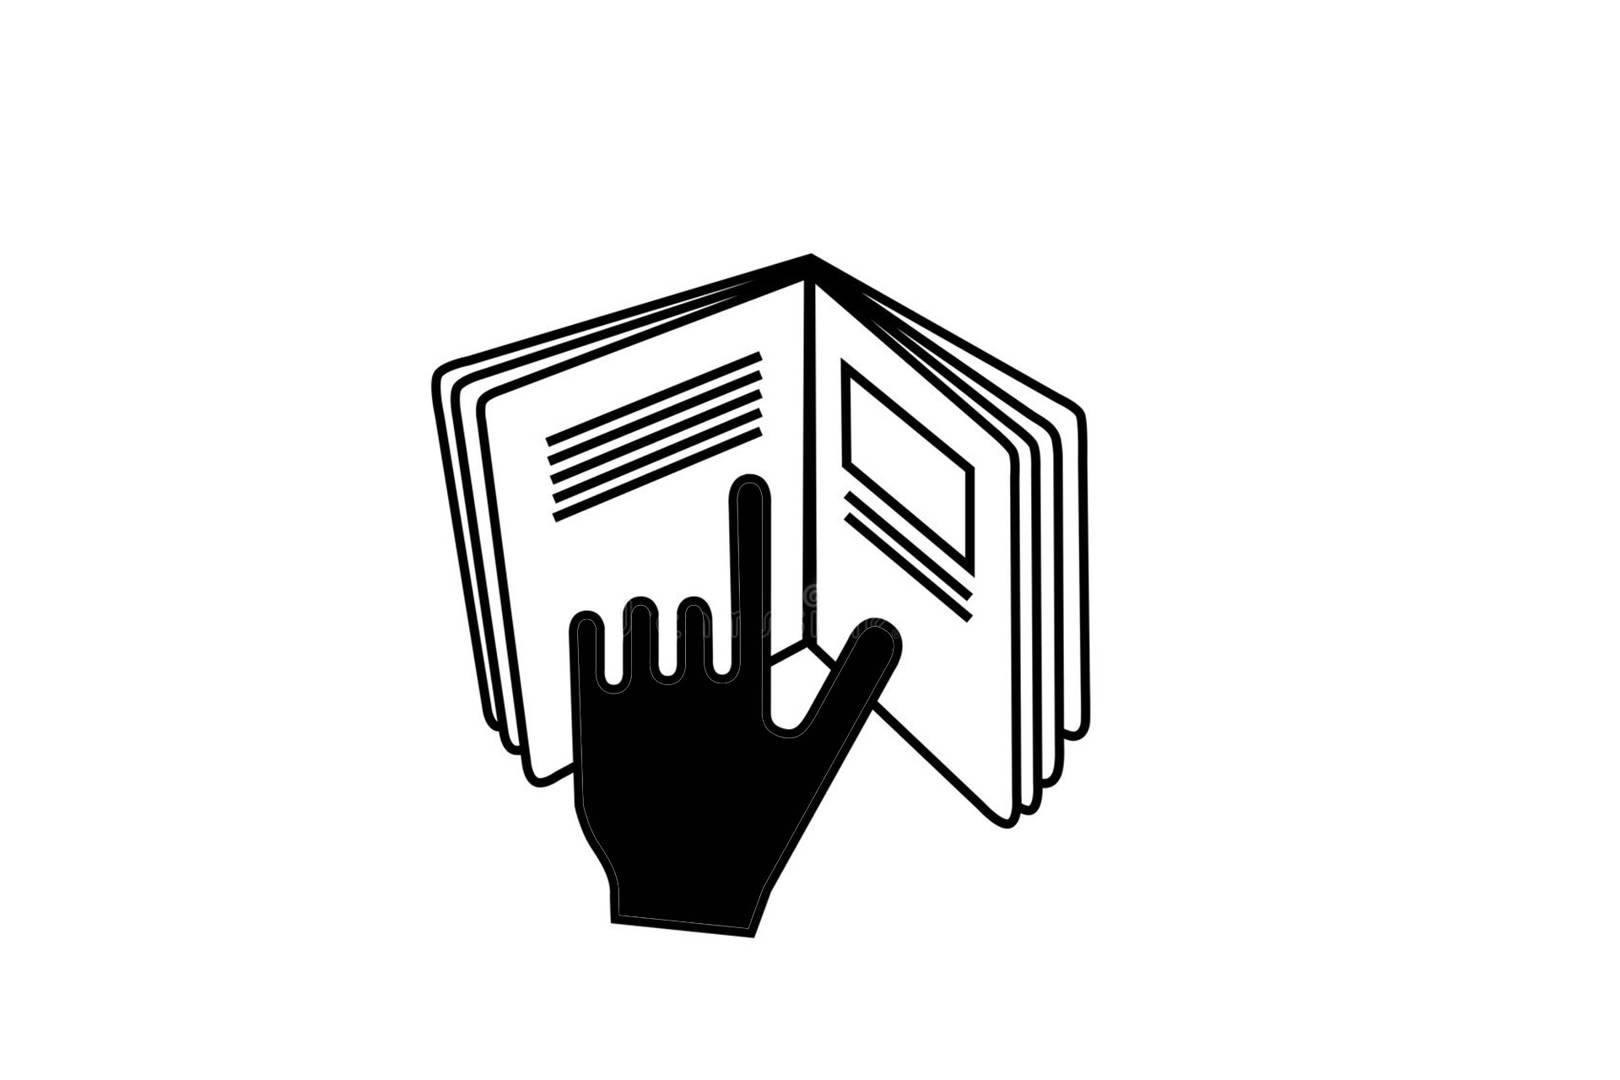 logo insert to read